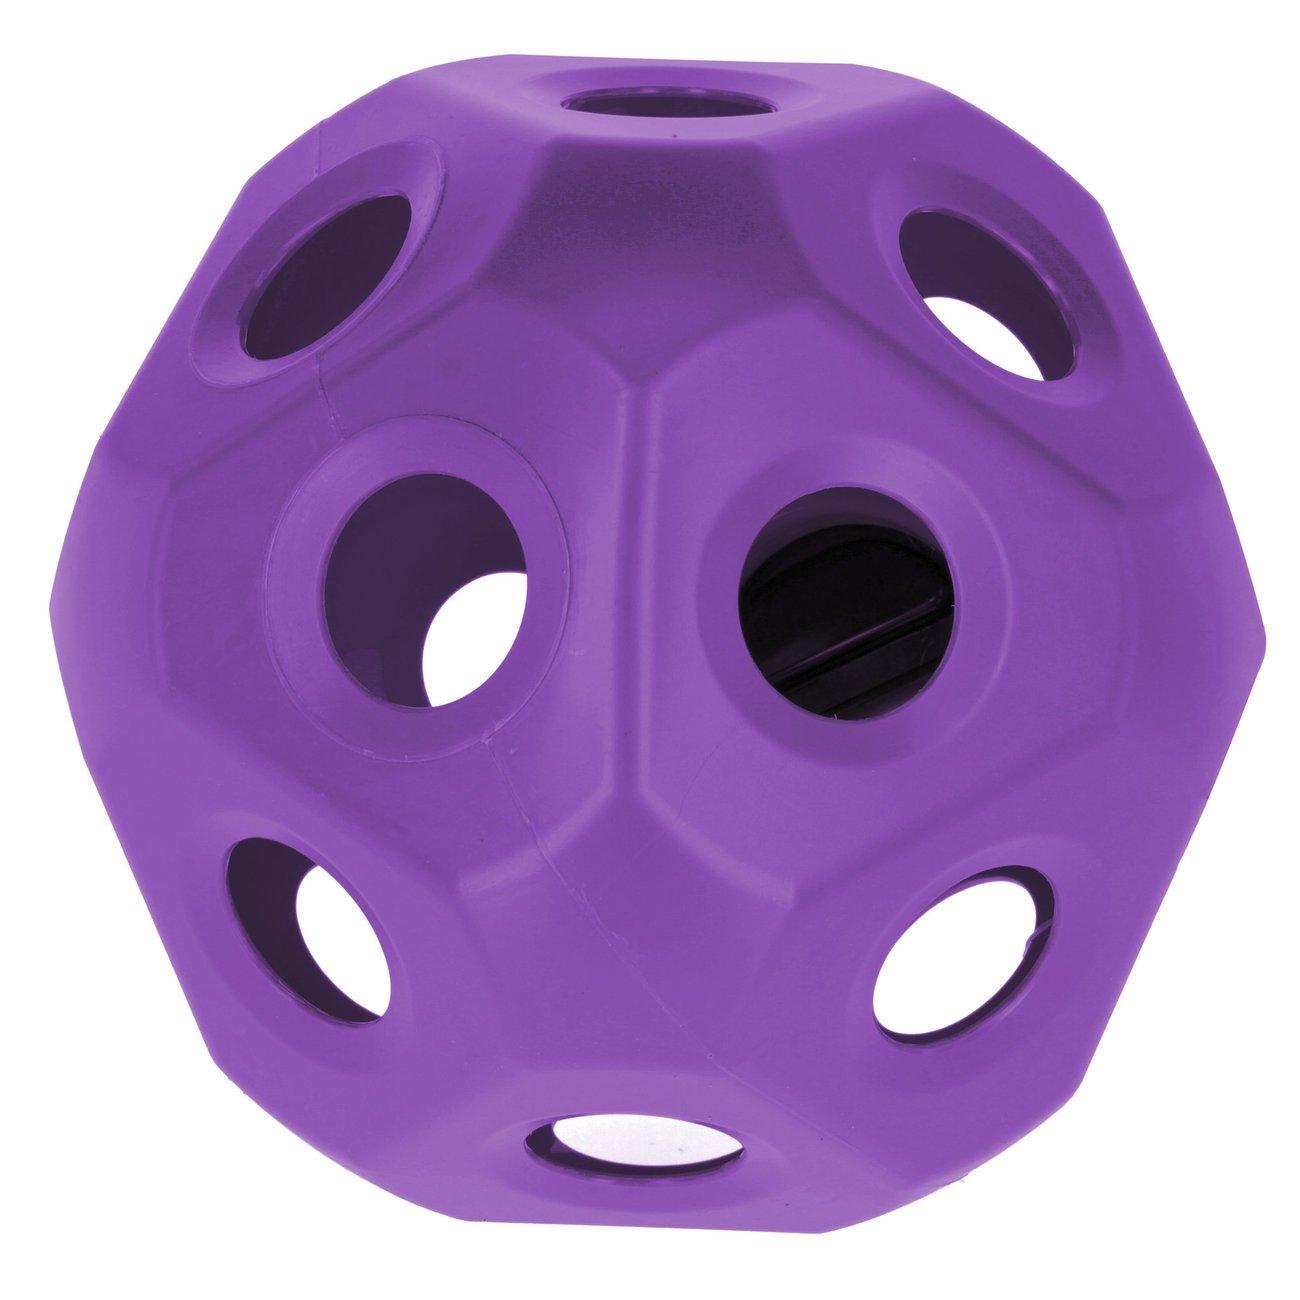 Kerbl HeuBoy Futterspielball für Pferde, Bild 5